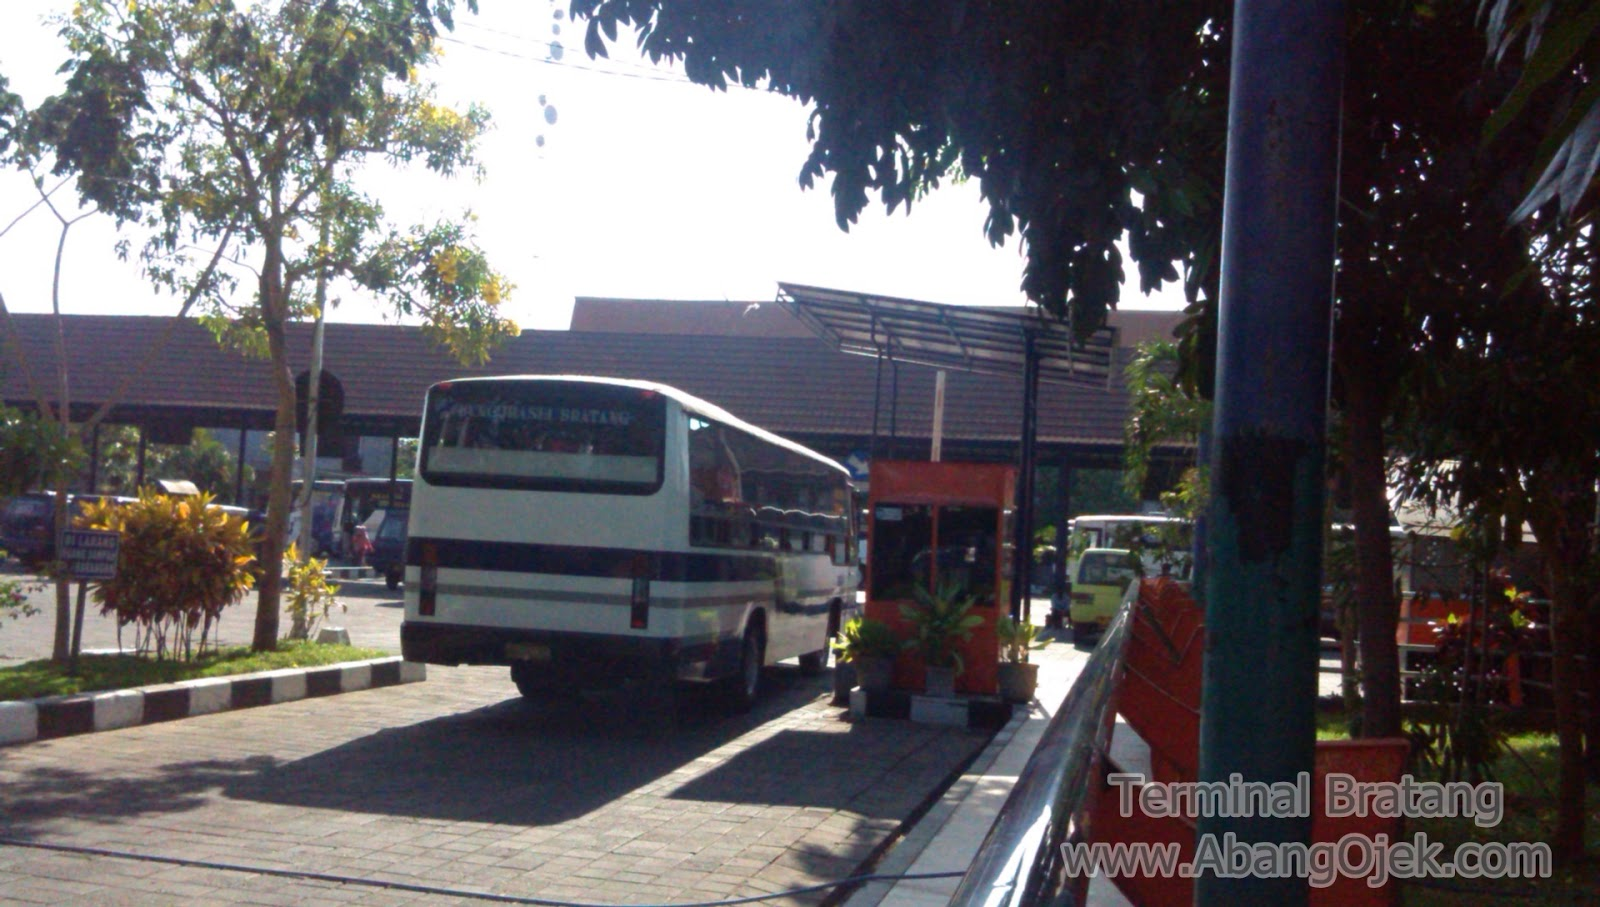 Terminal Bratang Surabaya Abang Ojek Taksi Motor Taxi Terdapat Angkot